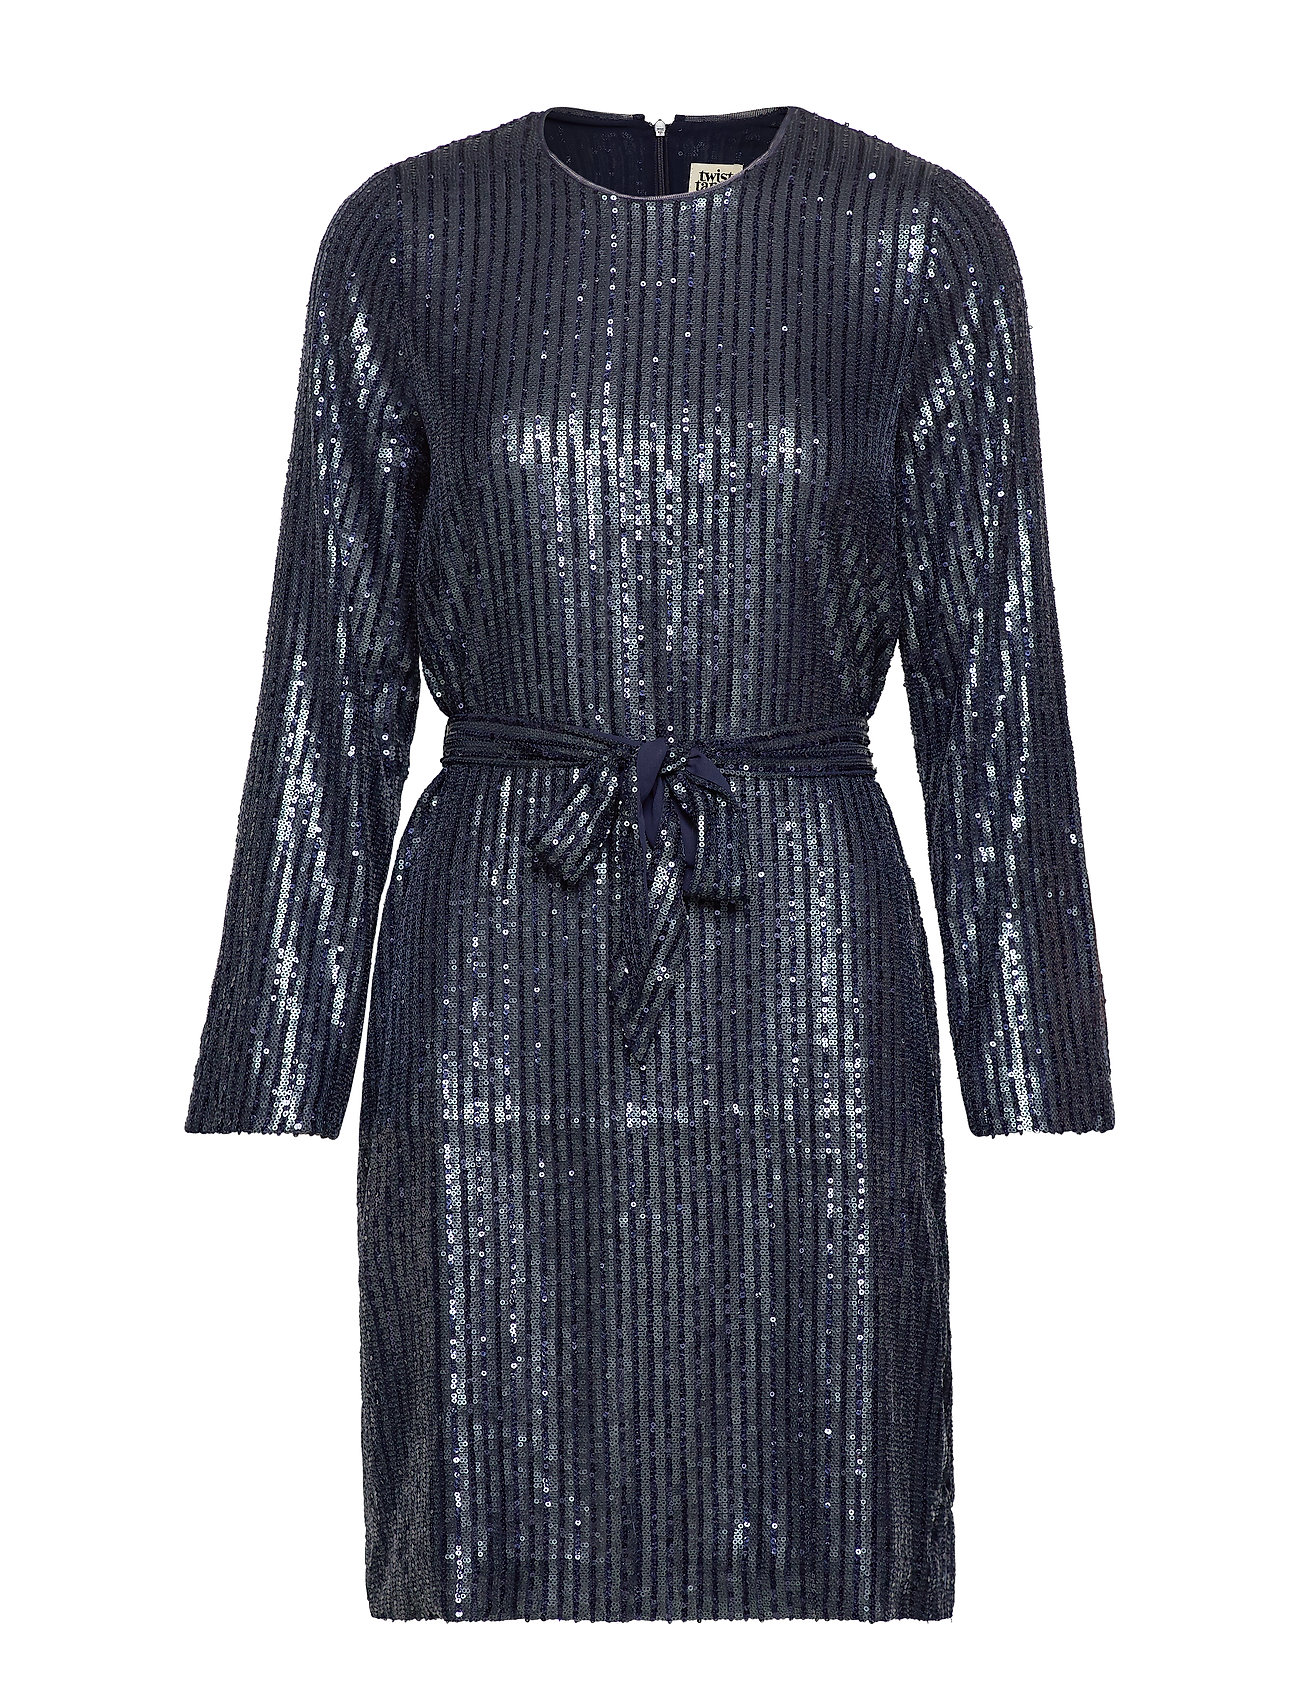 Twist & Tango Britta Sequin Dress - NAVY